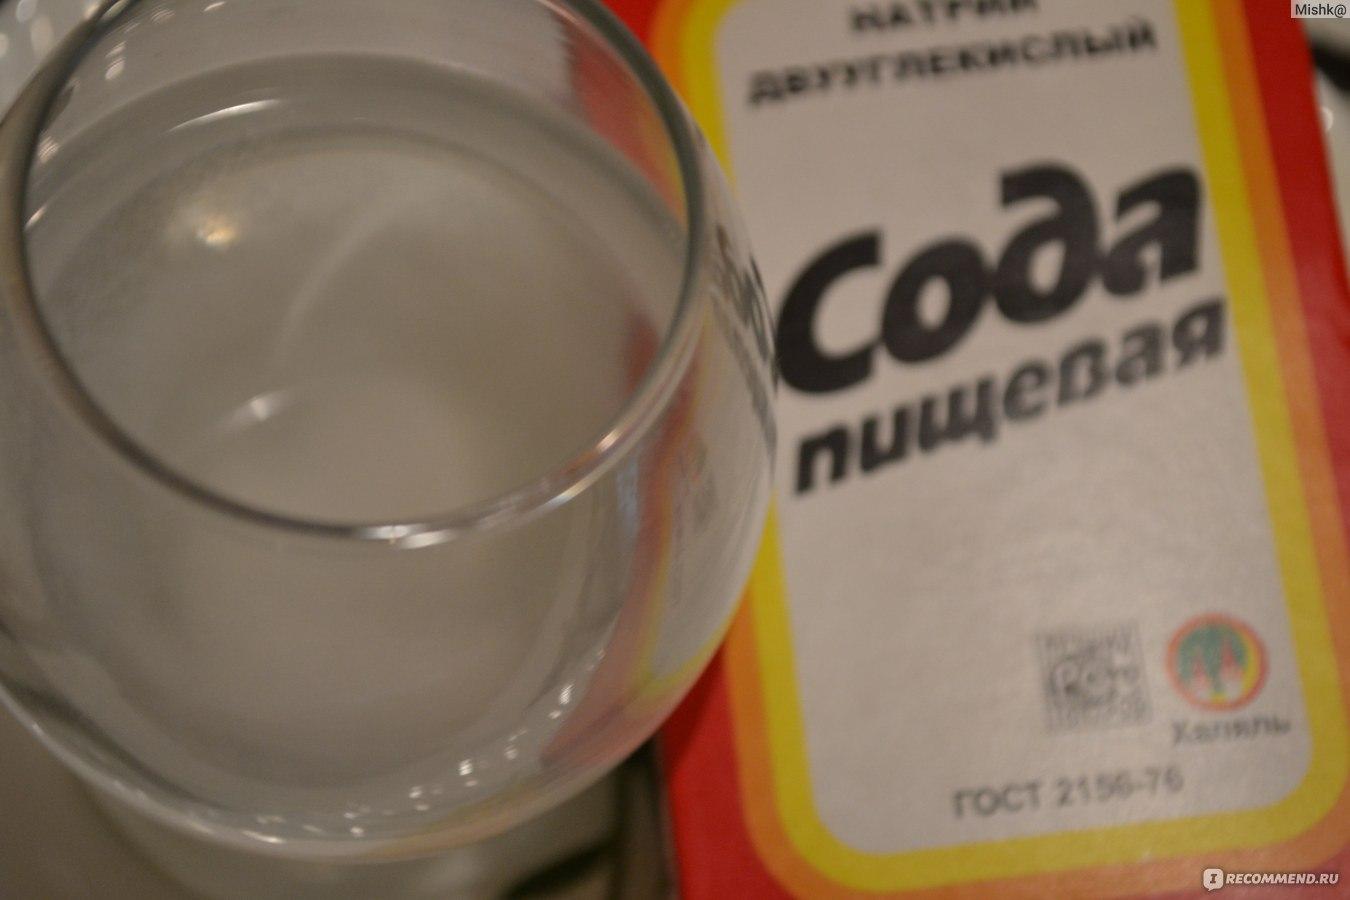 Лечит ли сода пищевая при гипертонии